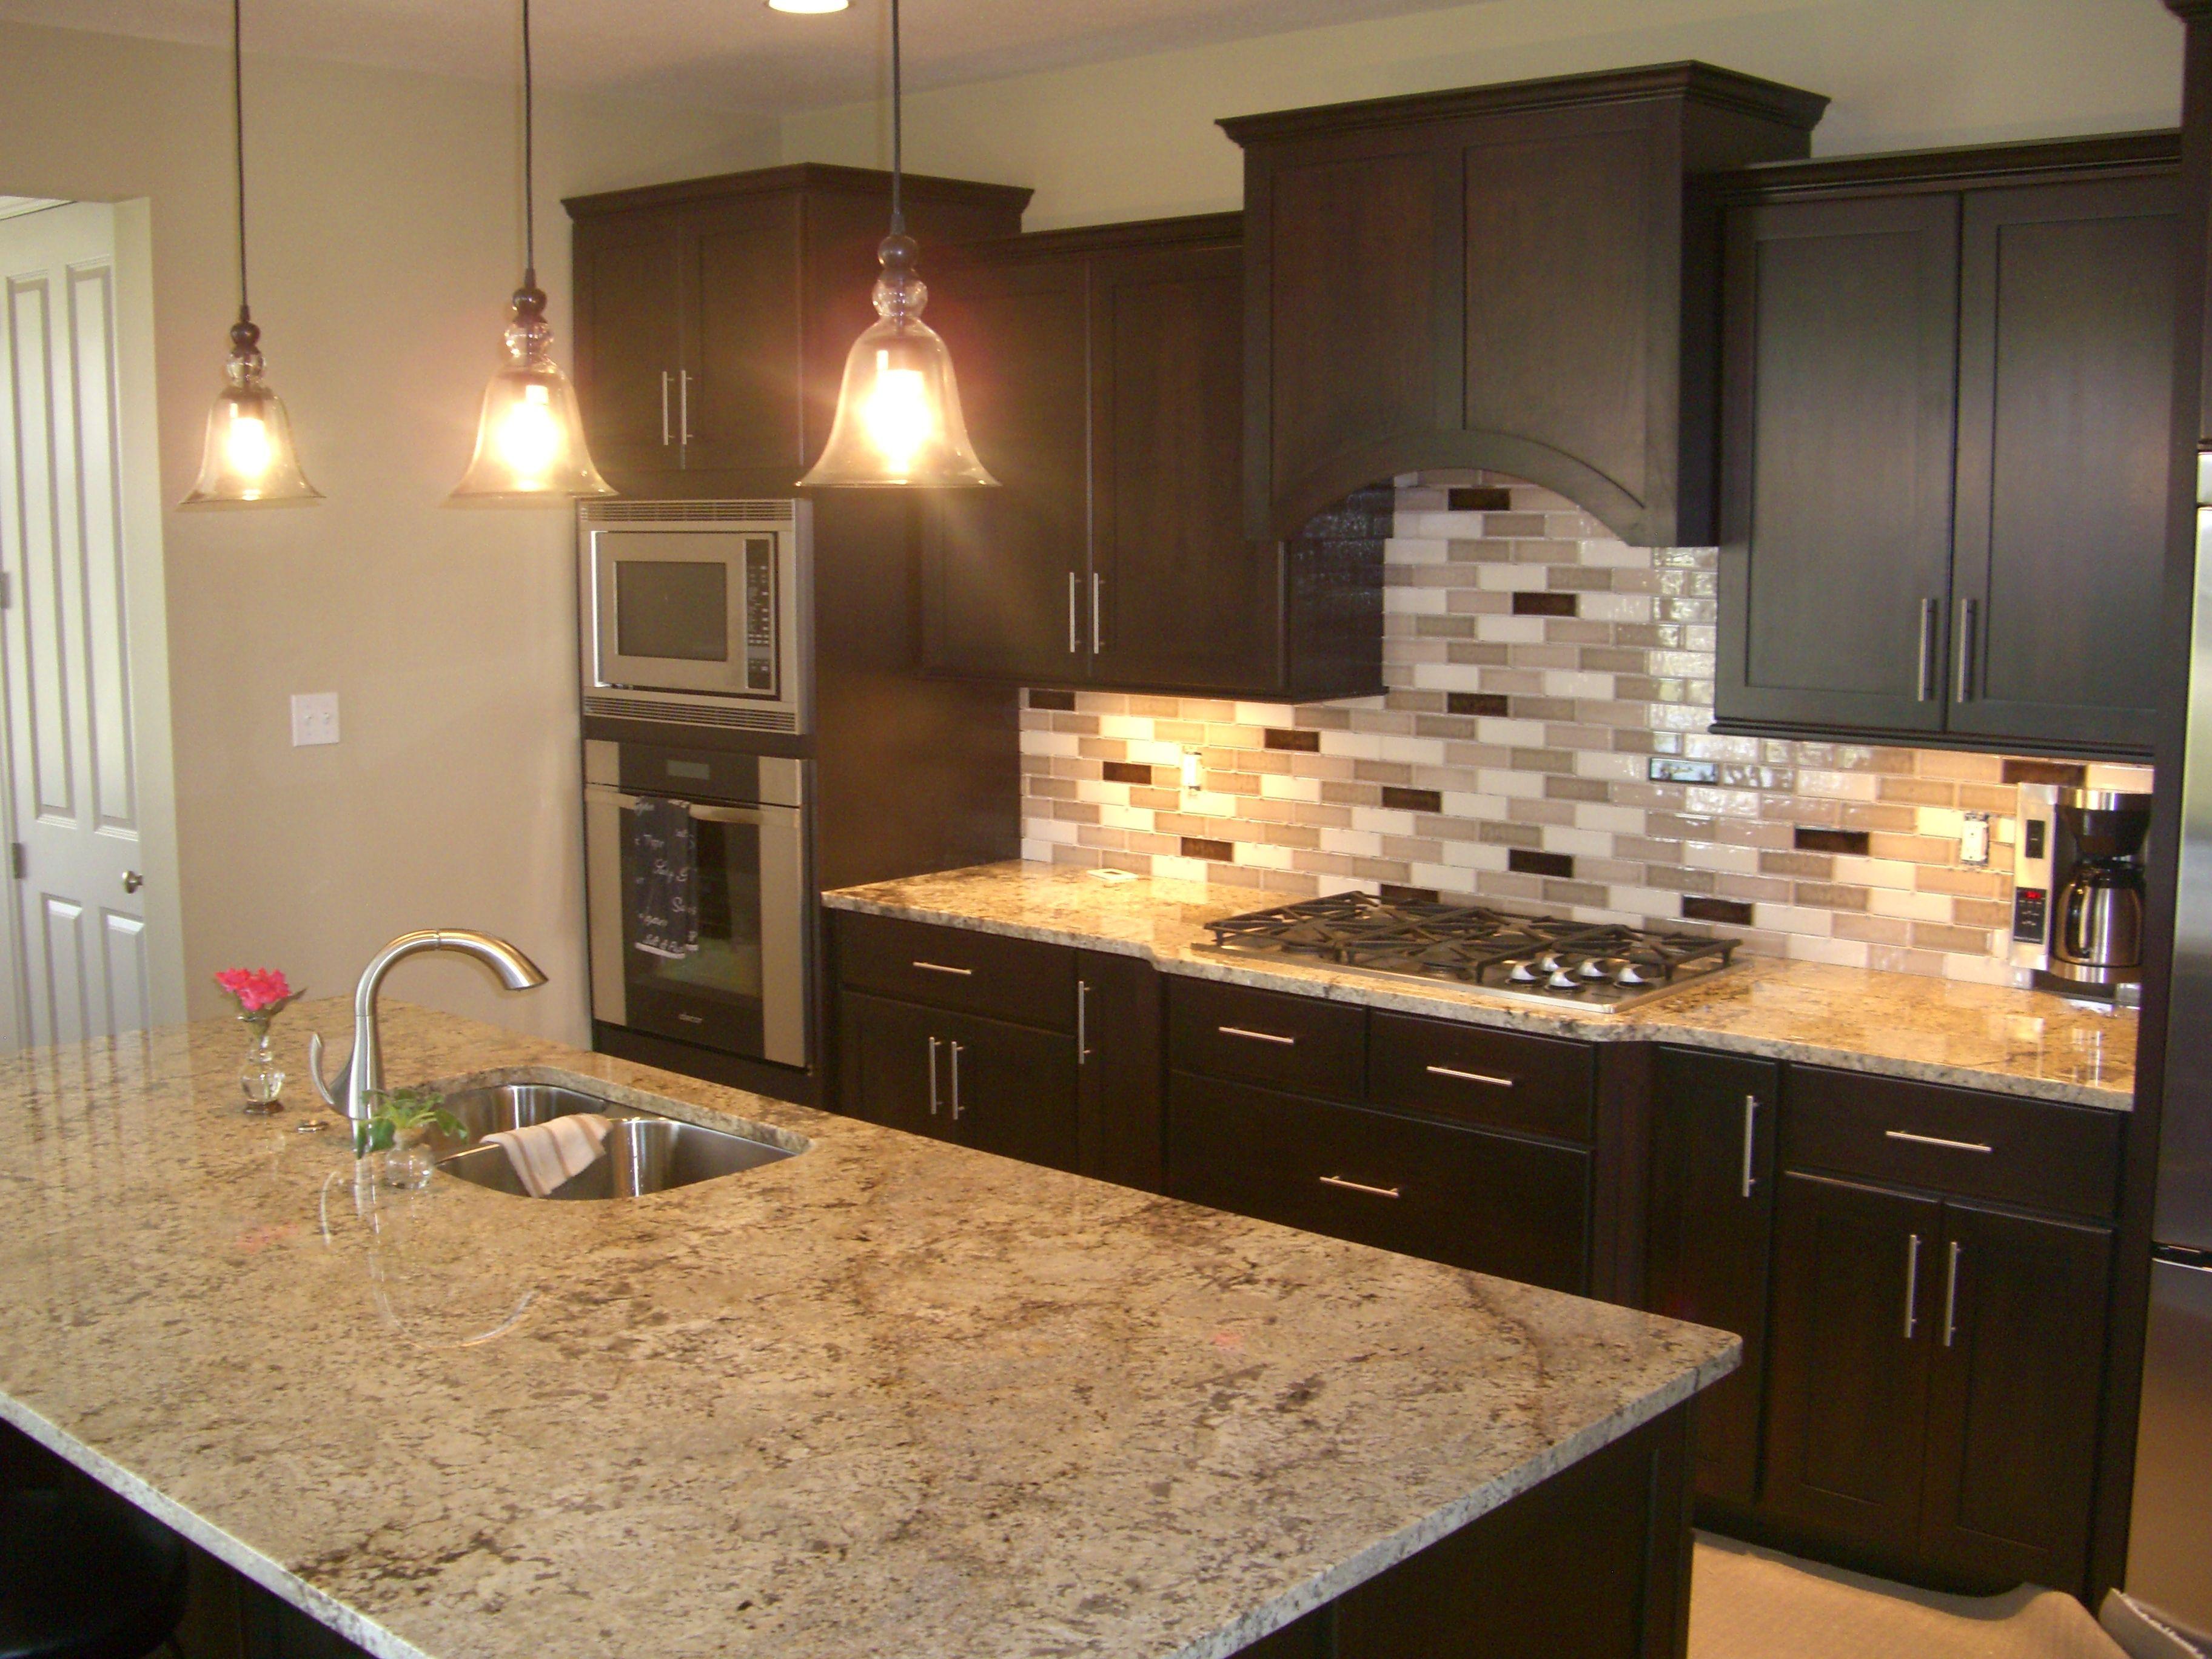 Kitchen Stone Backsplash Ideas With Dark Cabinets Tuscan